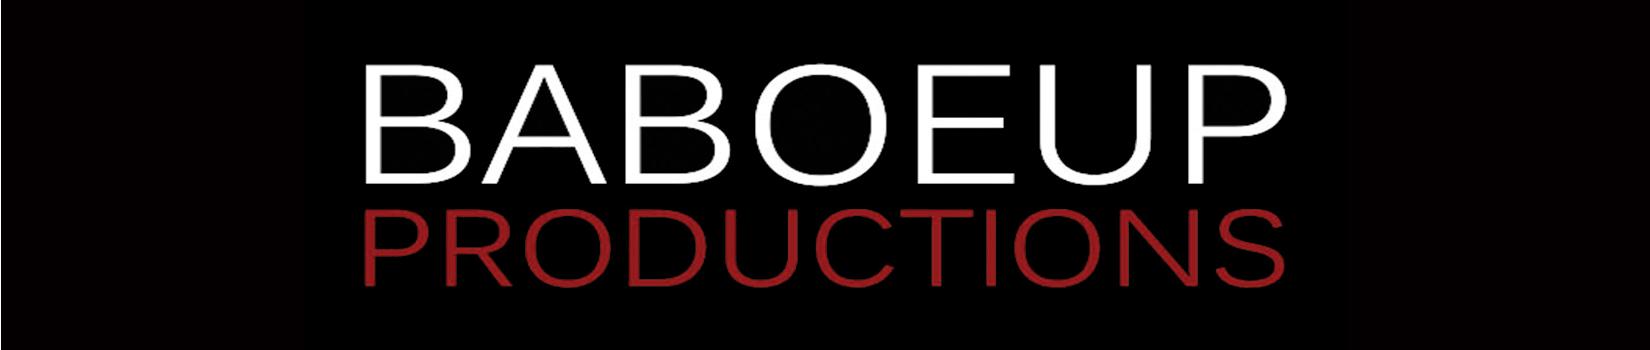 BABOEUP PRODUCTIONS